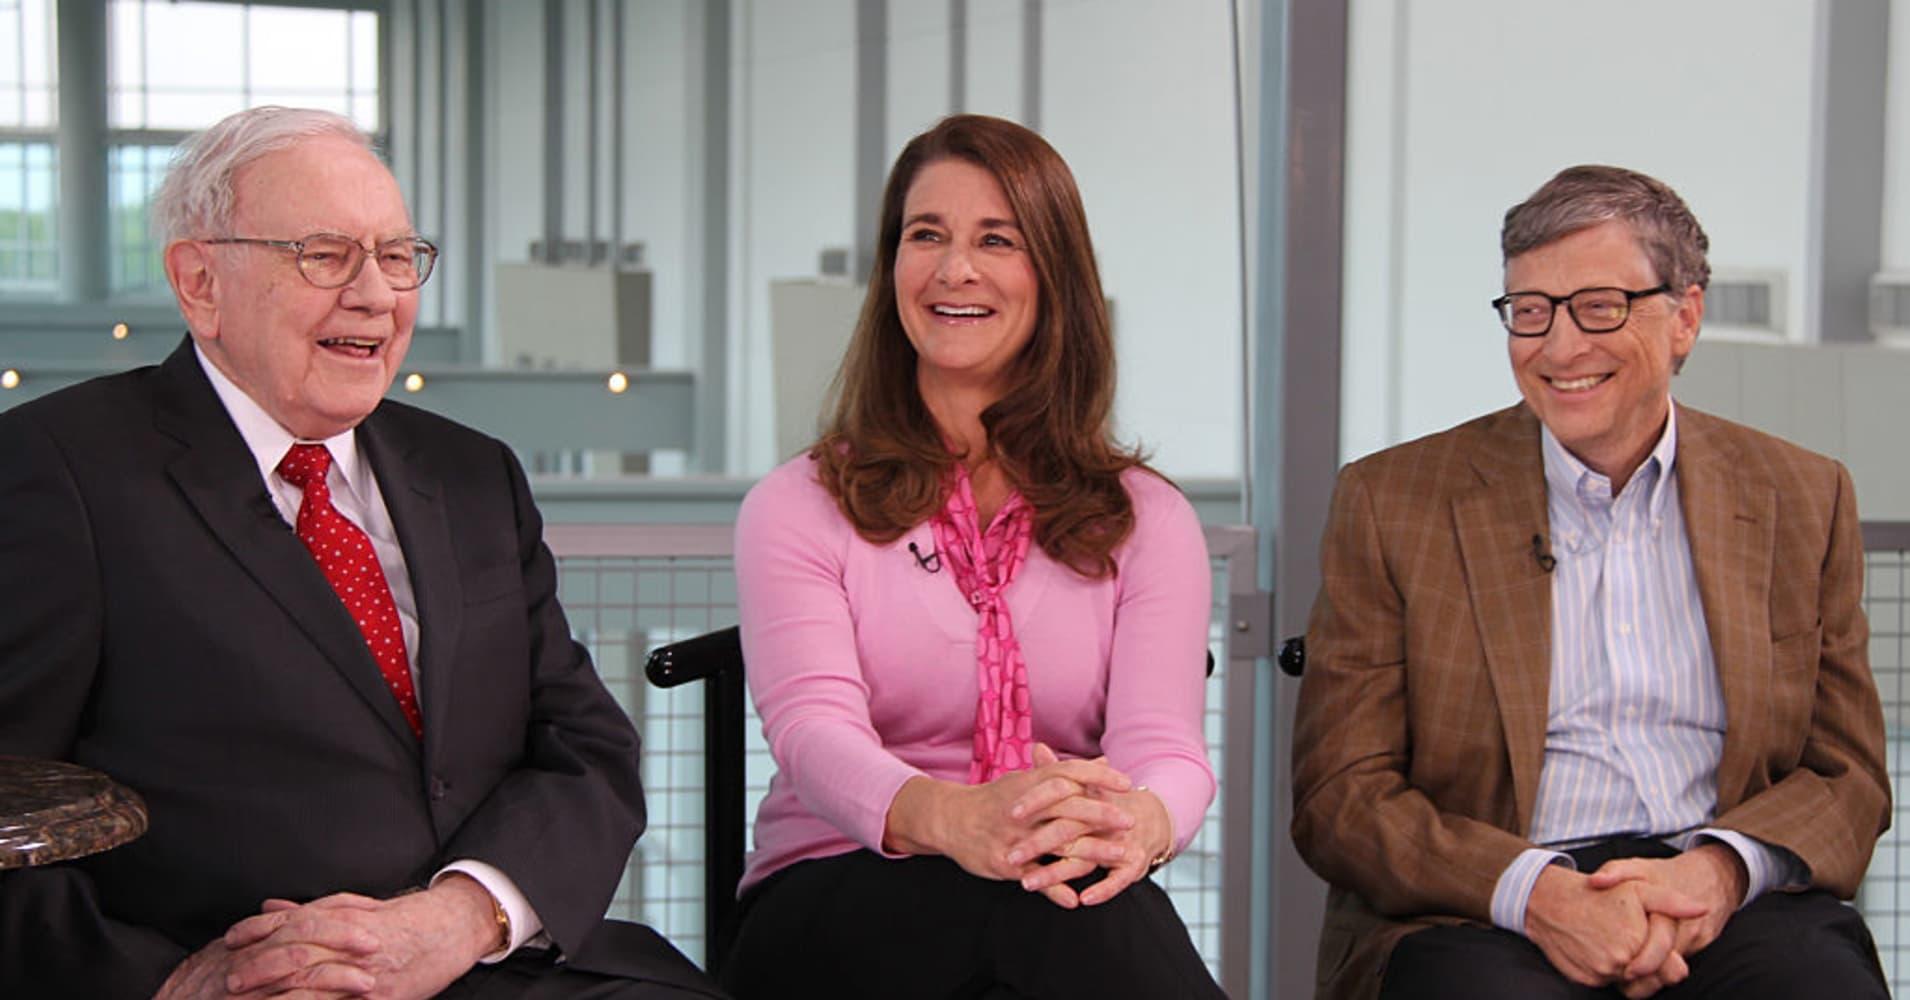 Warren Buffett, Bill and Melinda Gates